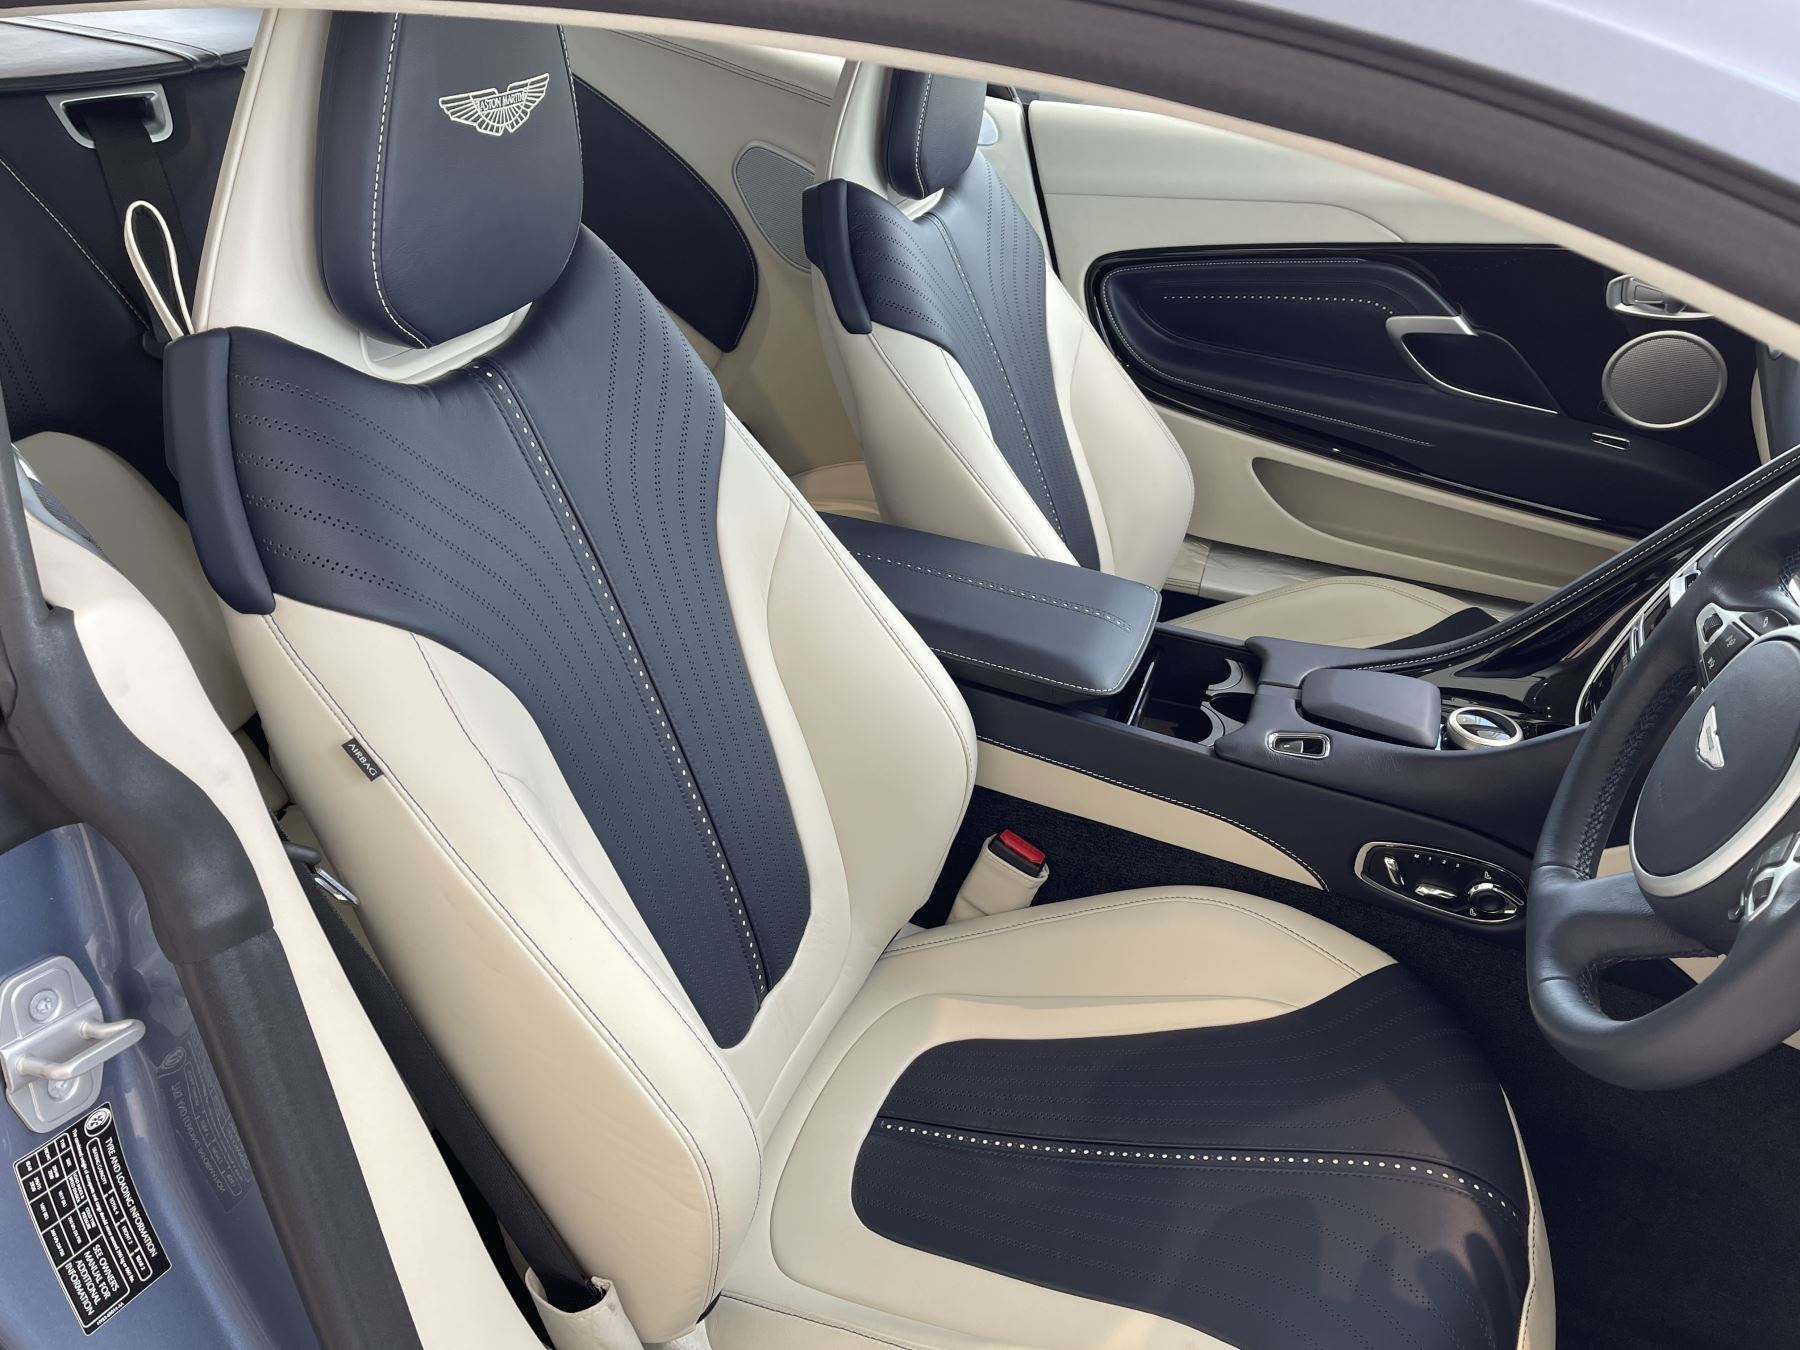 Aston Martin DB11 V8 Touchtronic image 8